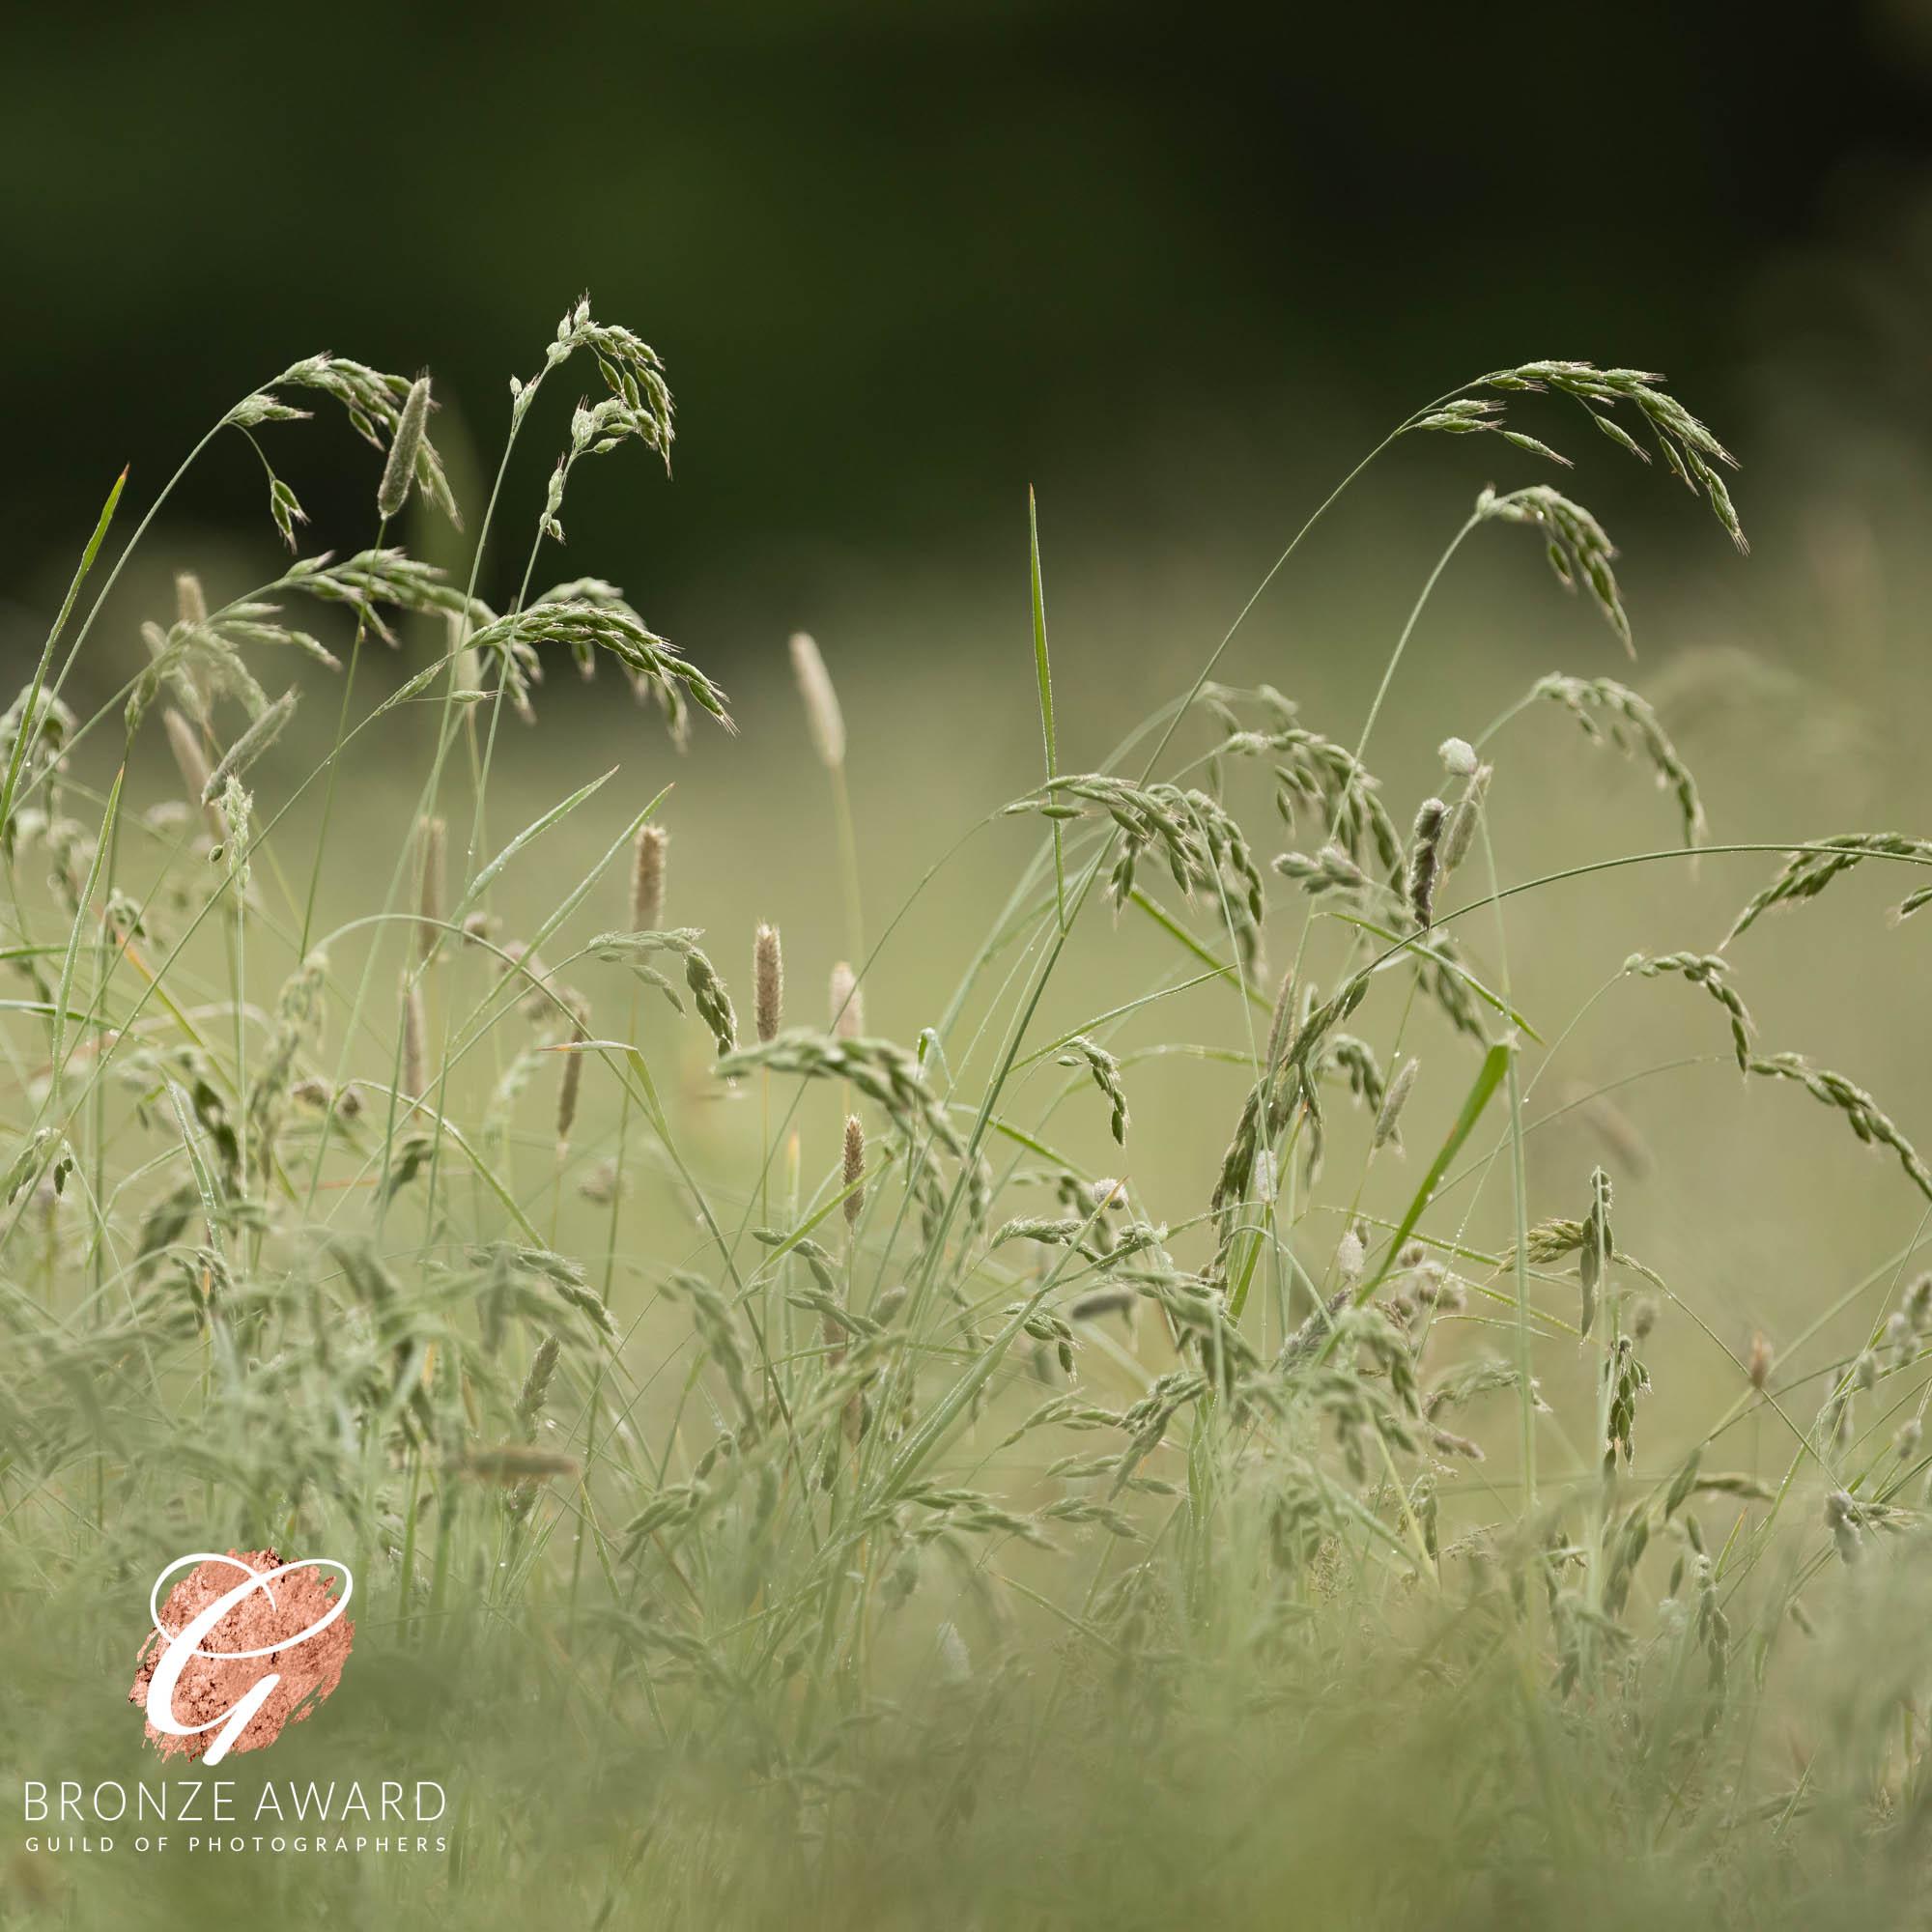 Grass, dew